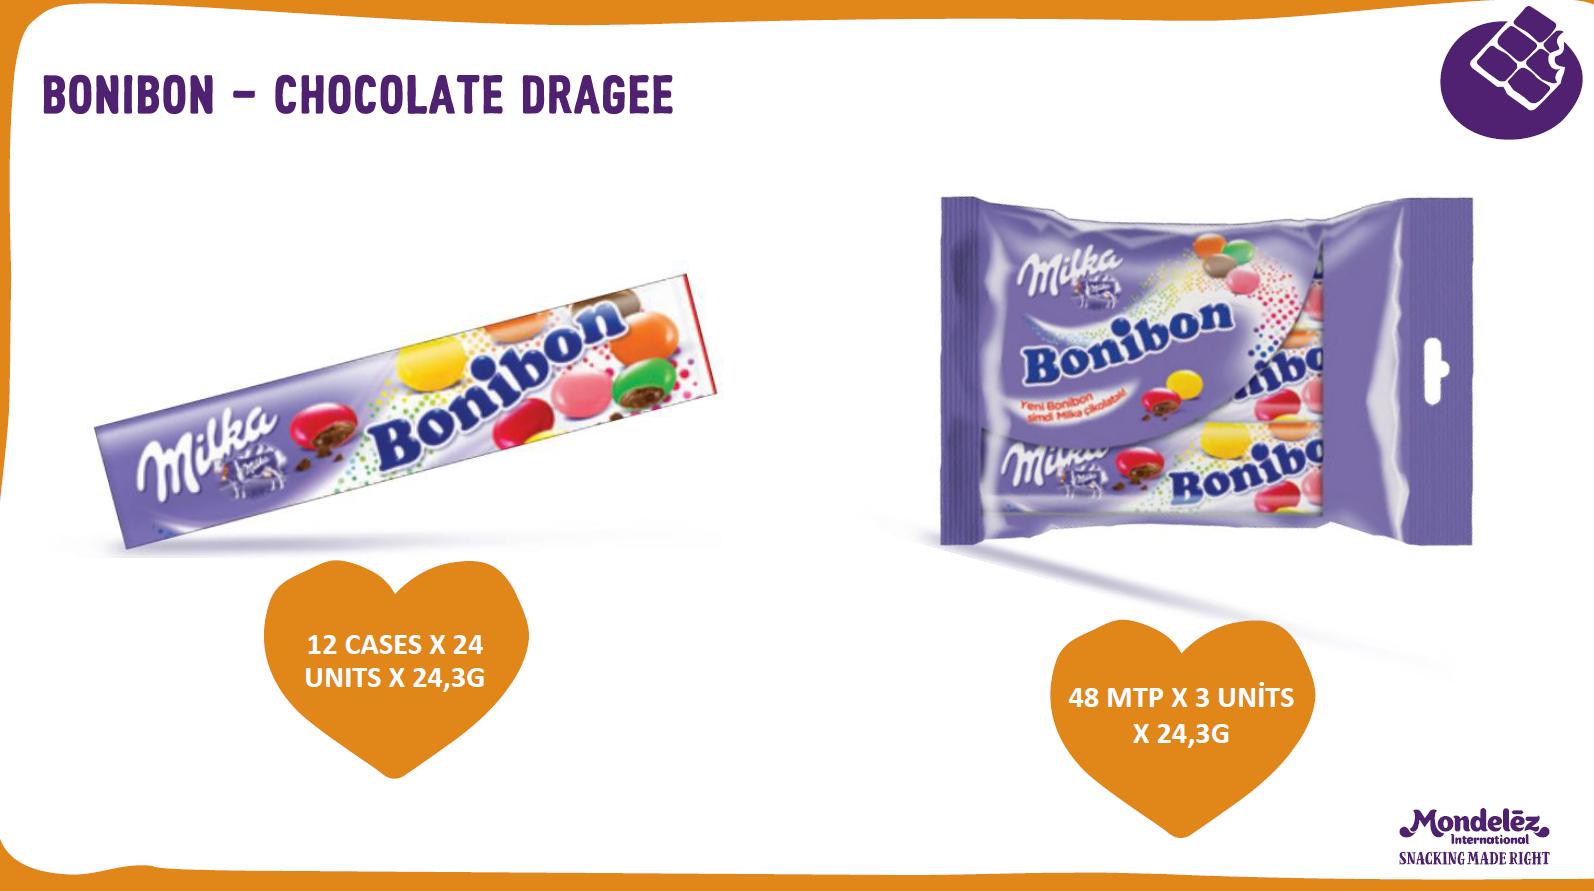 BONINOB - CHOCOLATE DRAGEE